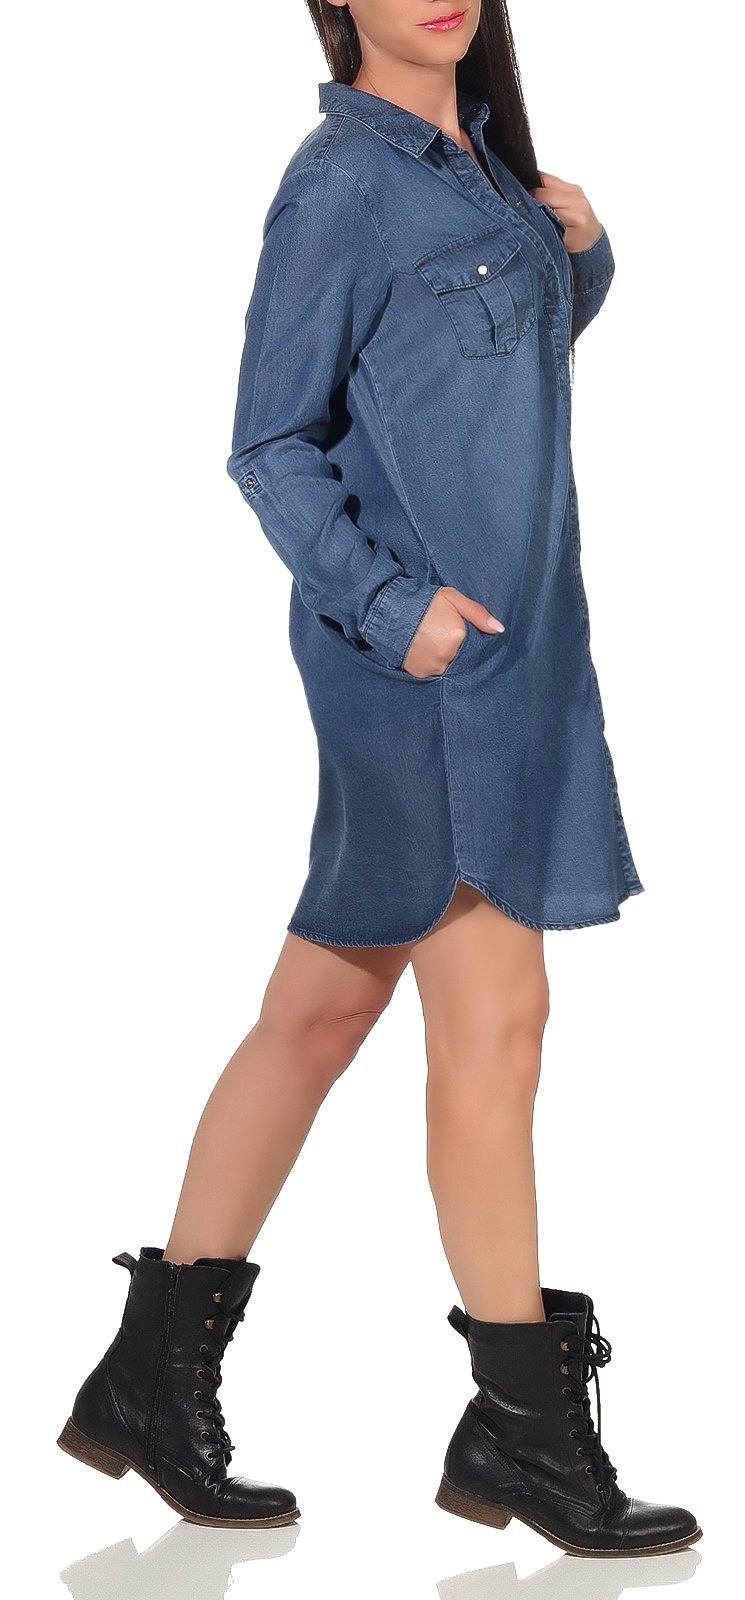 Damen Kleid Jeanskleid Hemdkleid Shirtkleid Minikleid